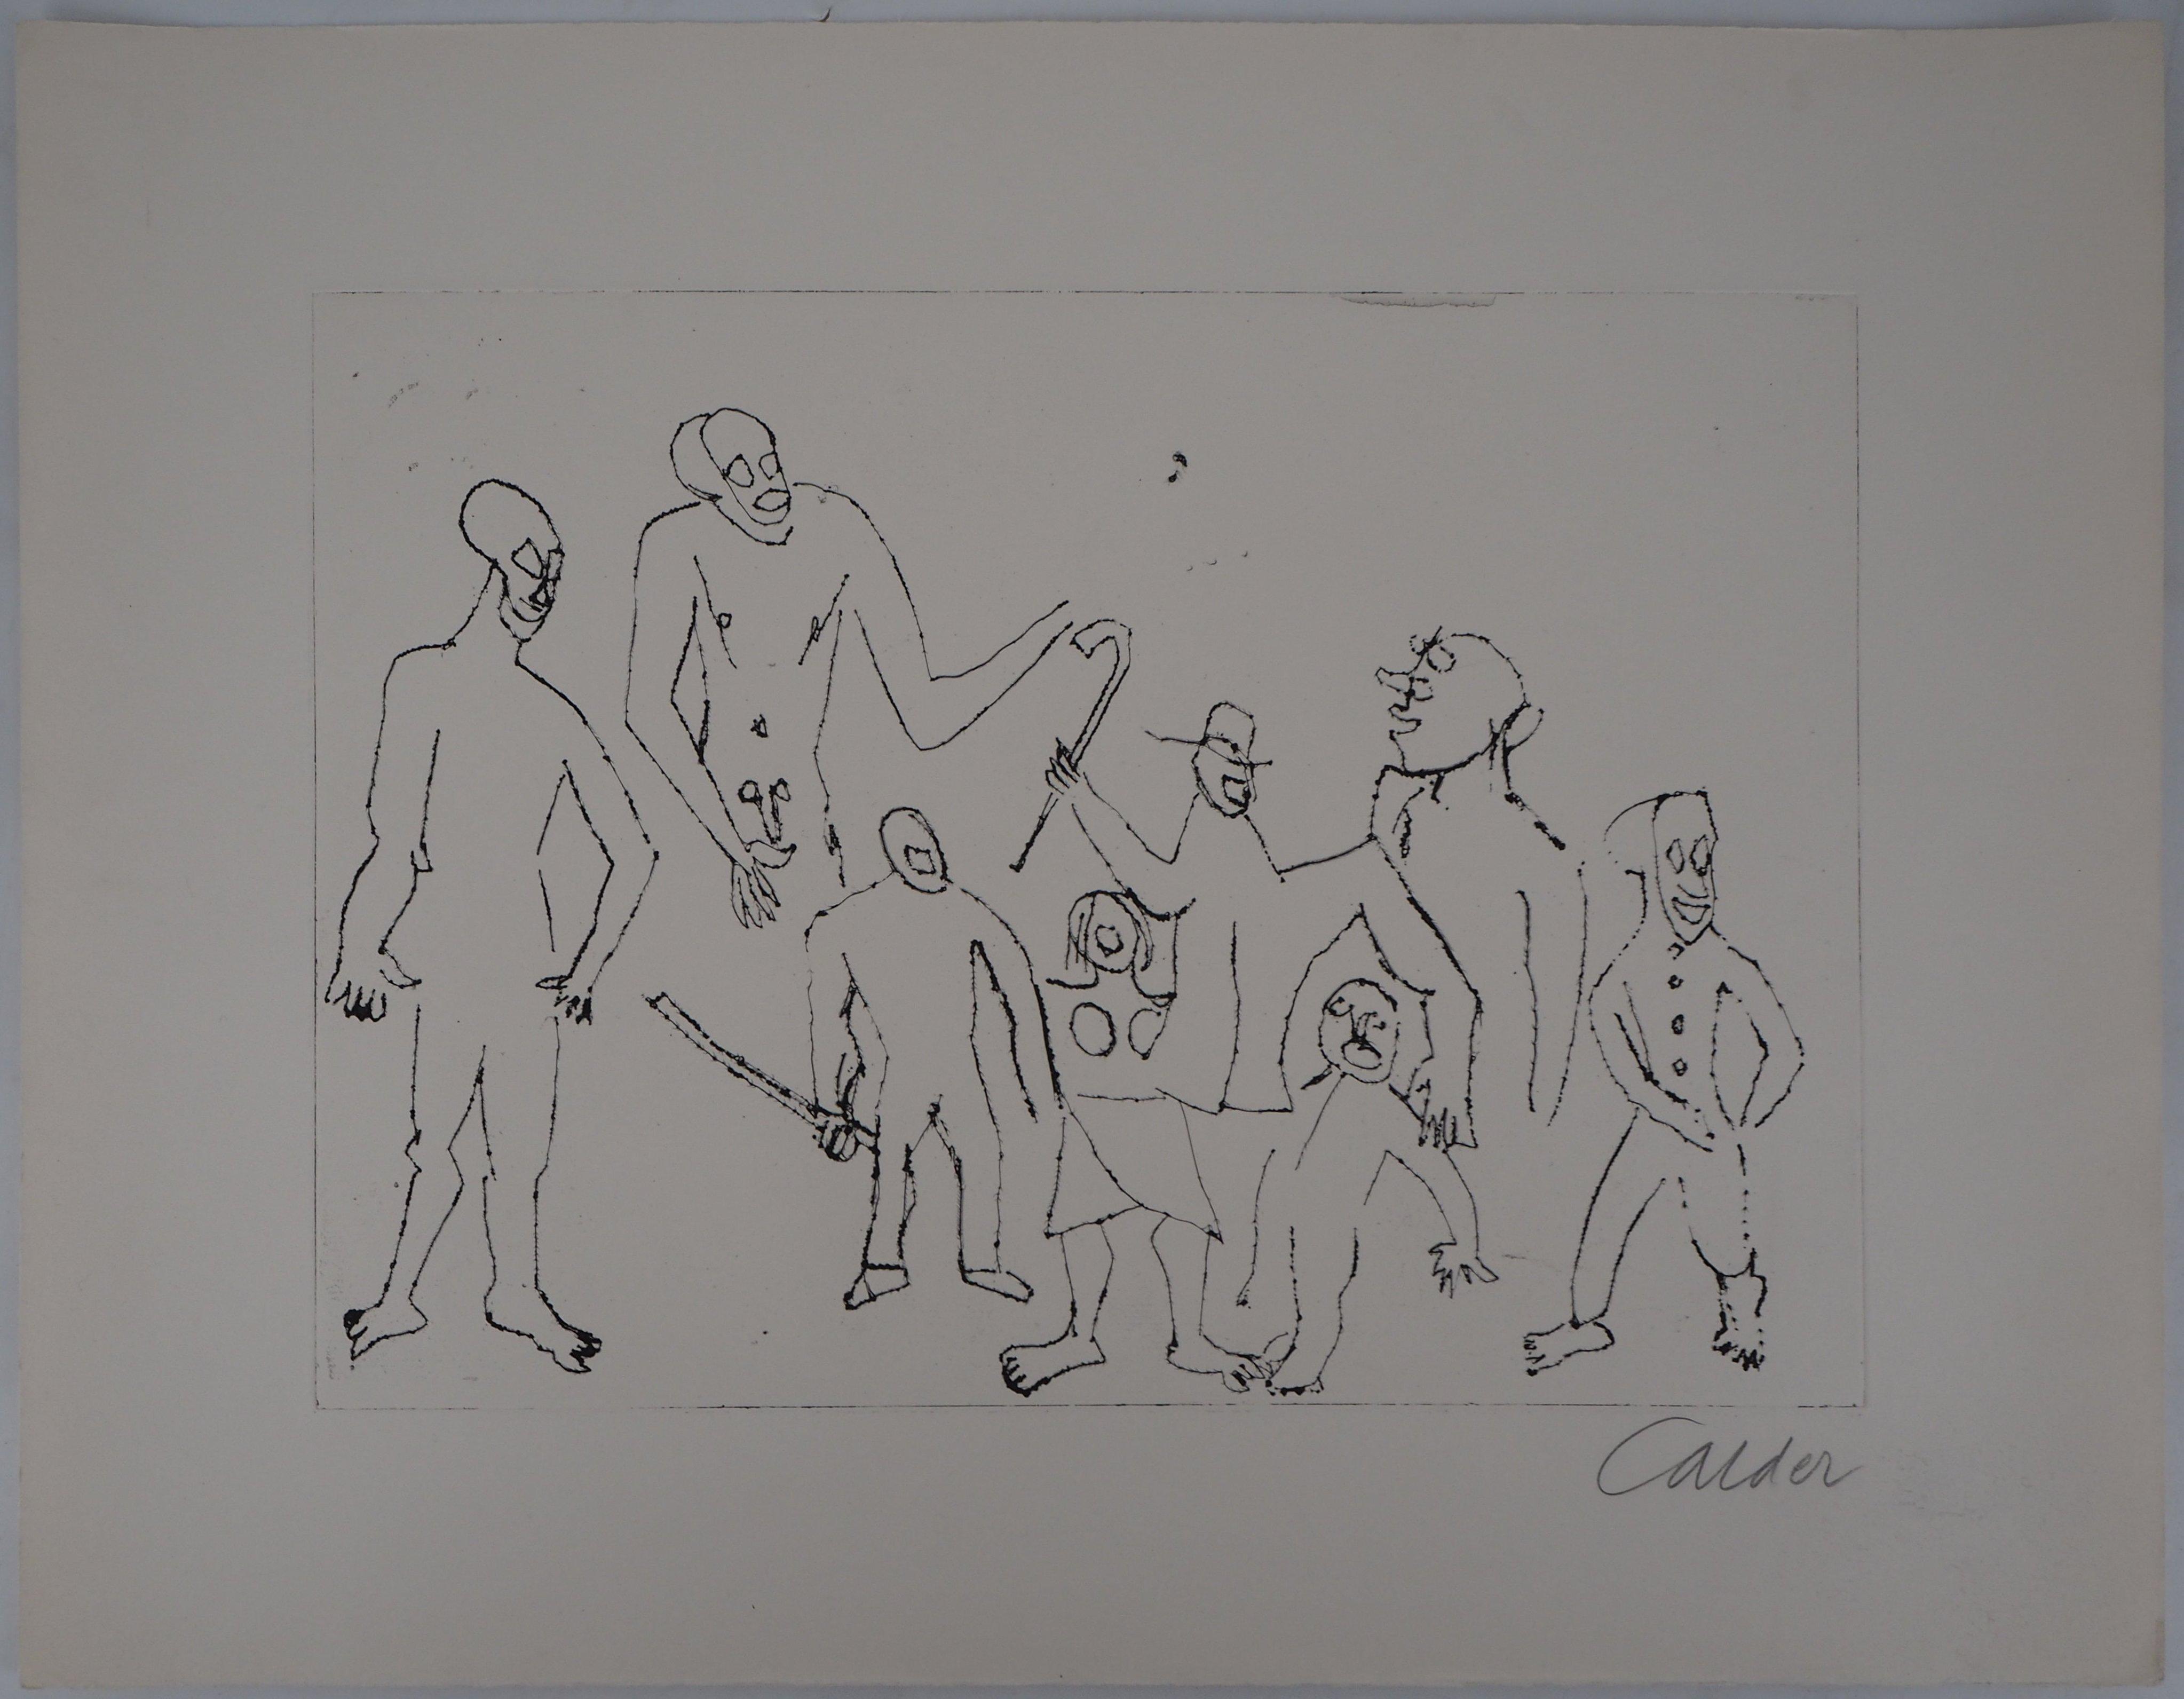 Santa Claus : Figures with Canes - Original Handsigned Etching